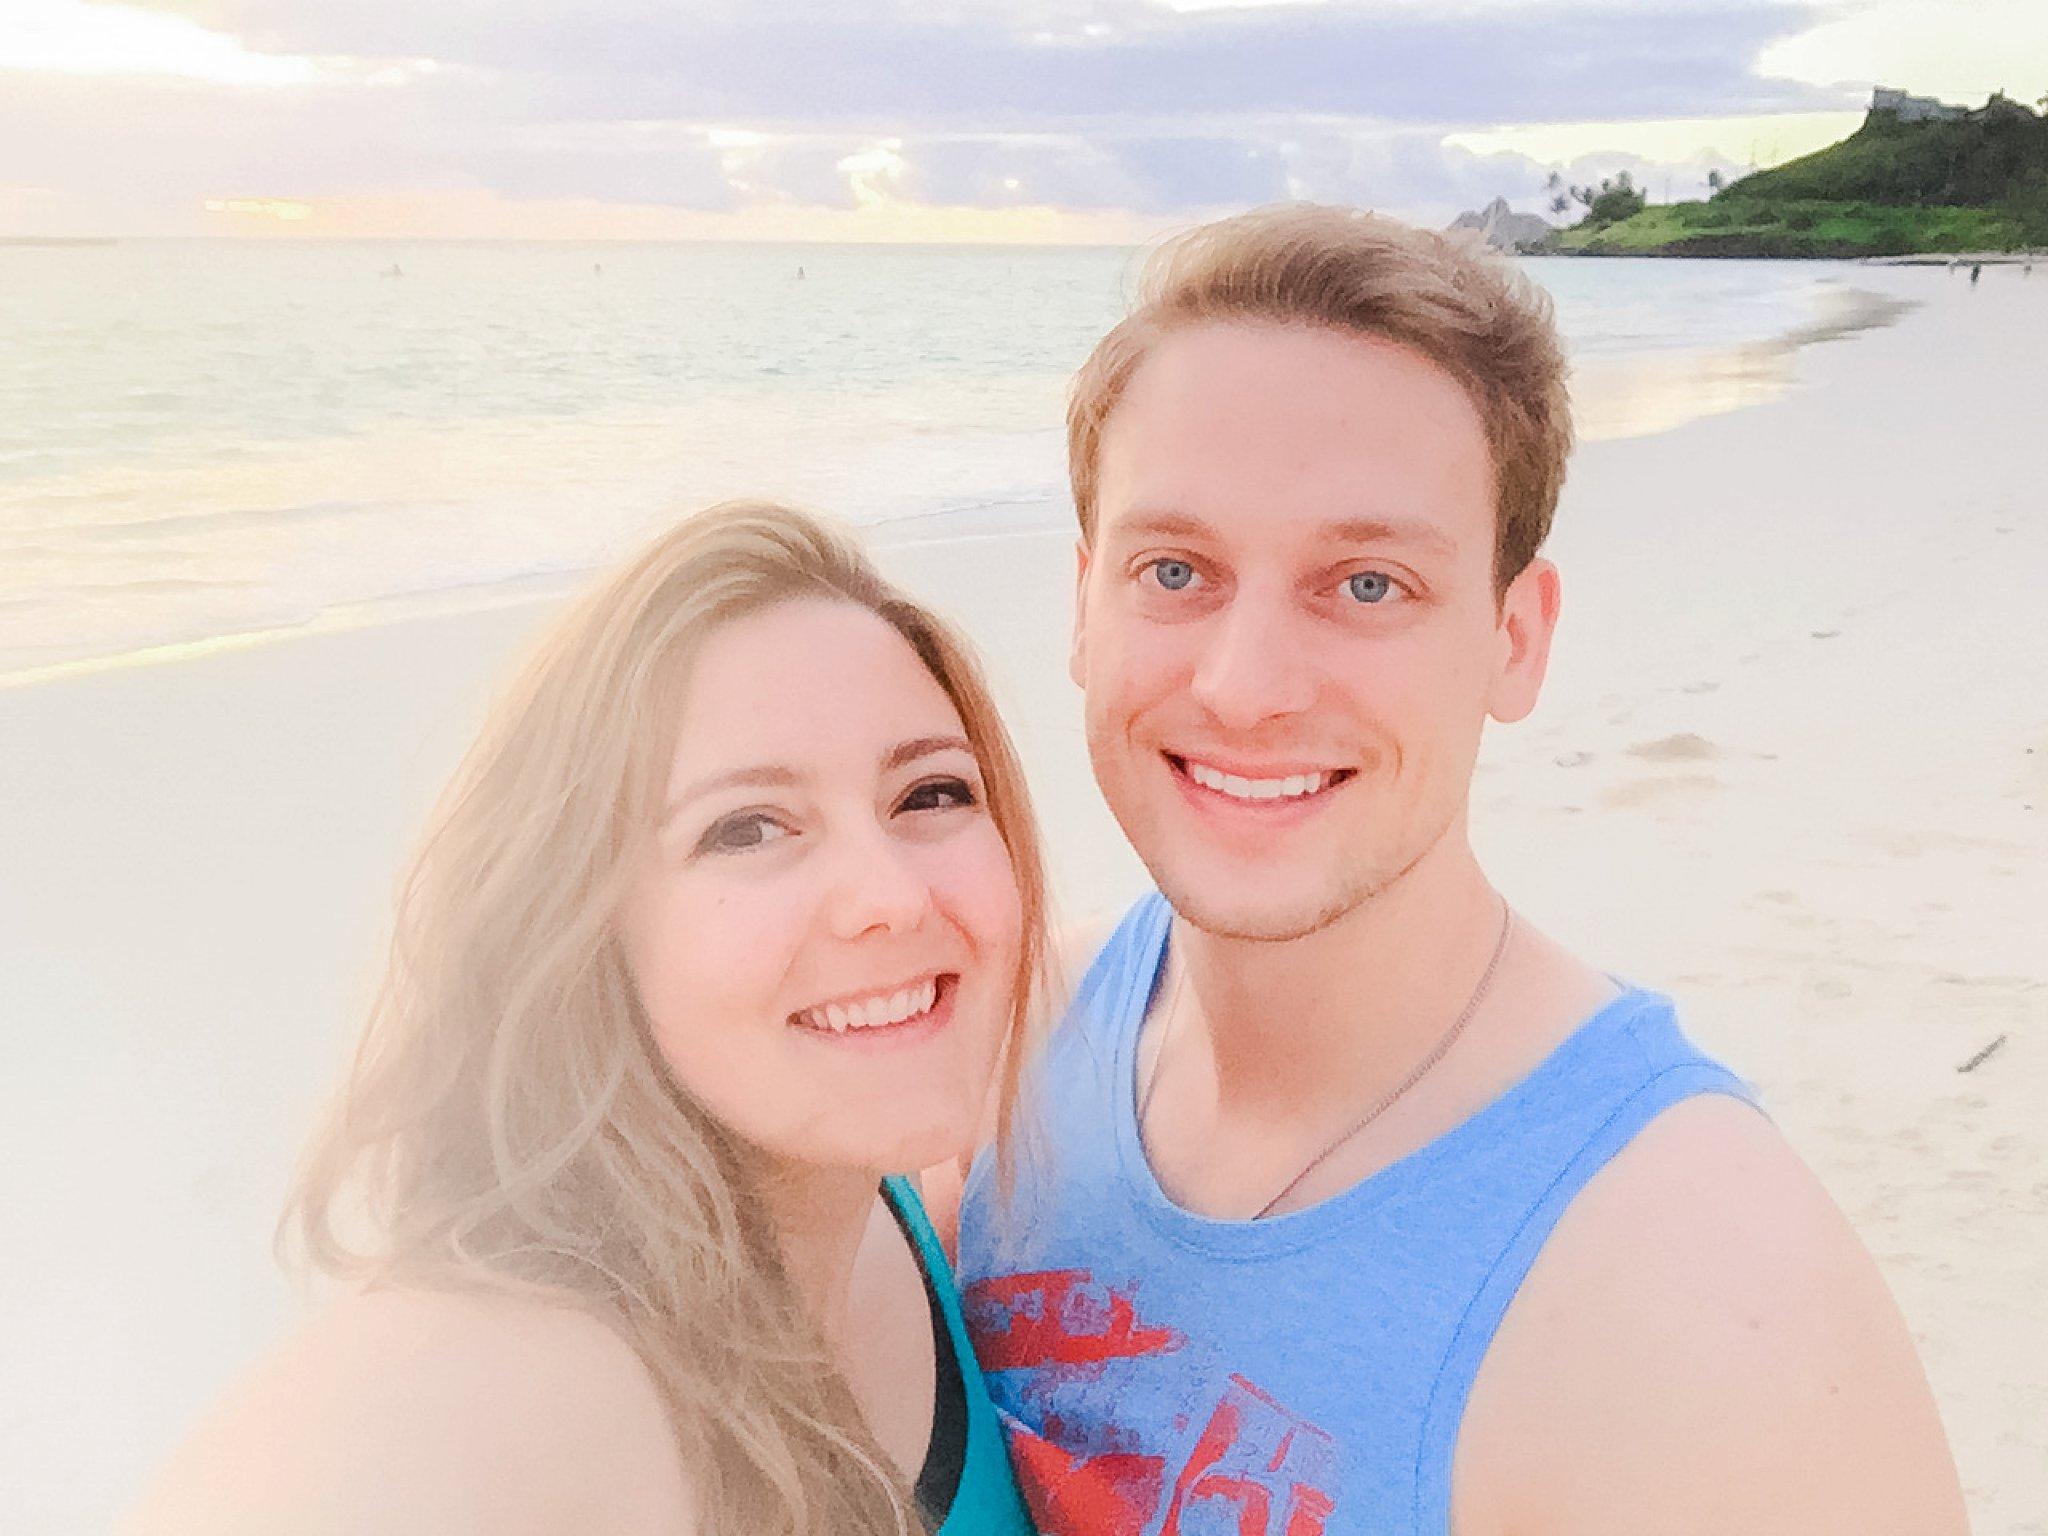 Hawaii Honeymoon Photos Megan & Justin Oahu Vacation Things To Do-2375.jpg